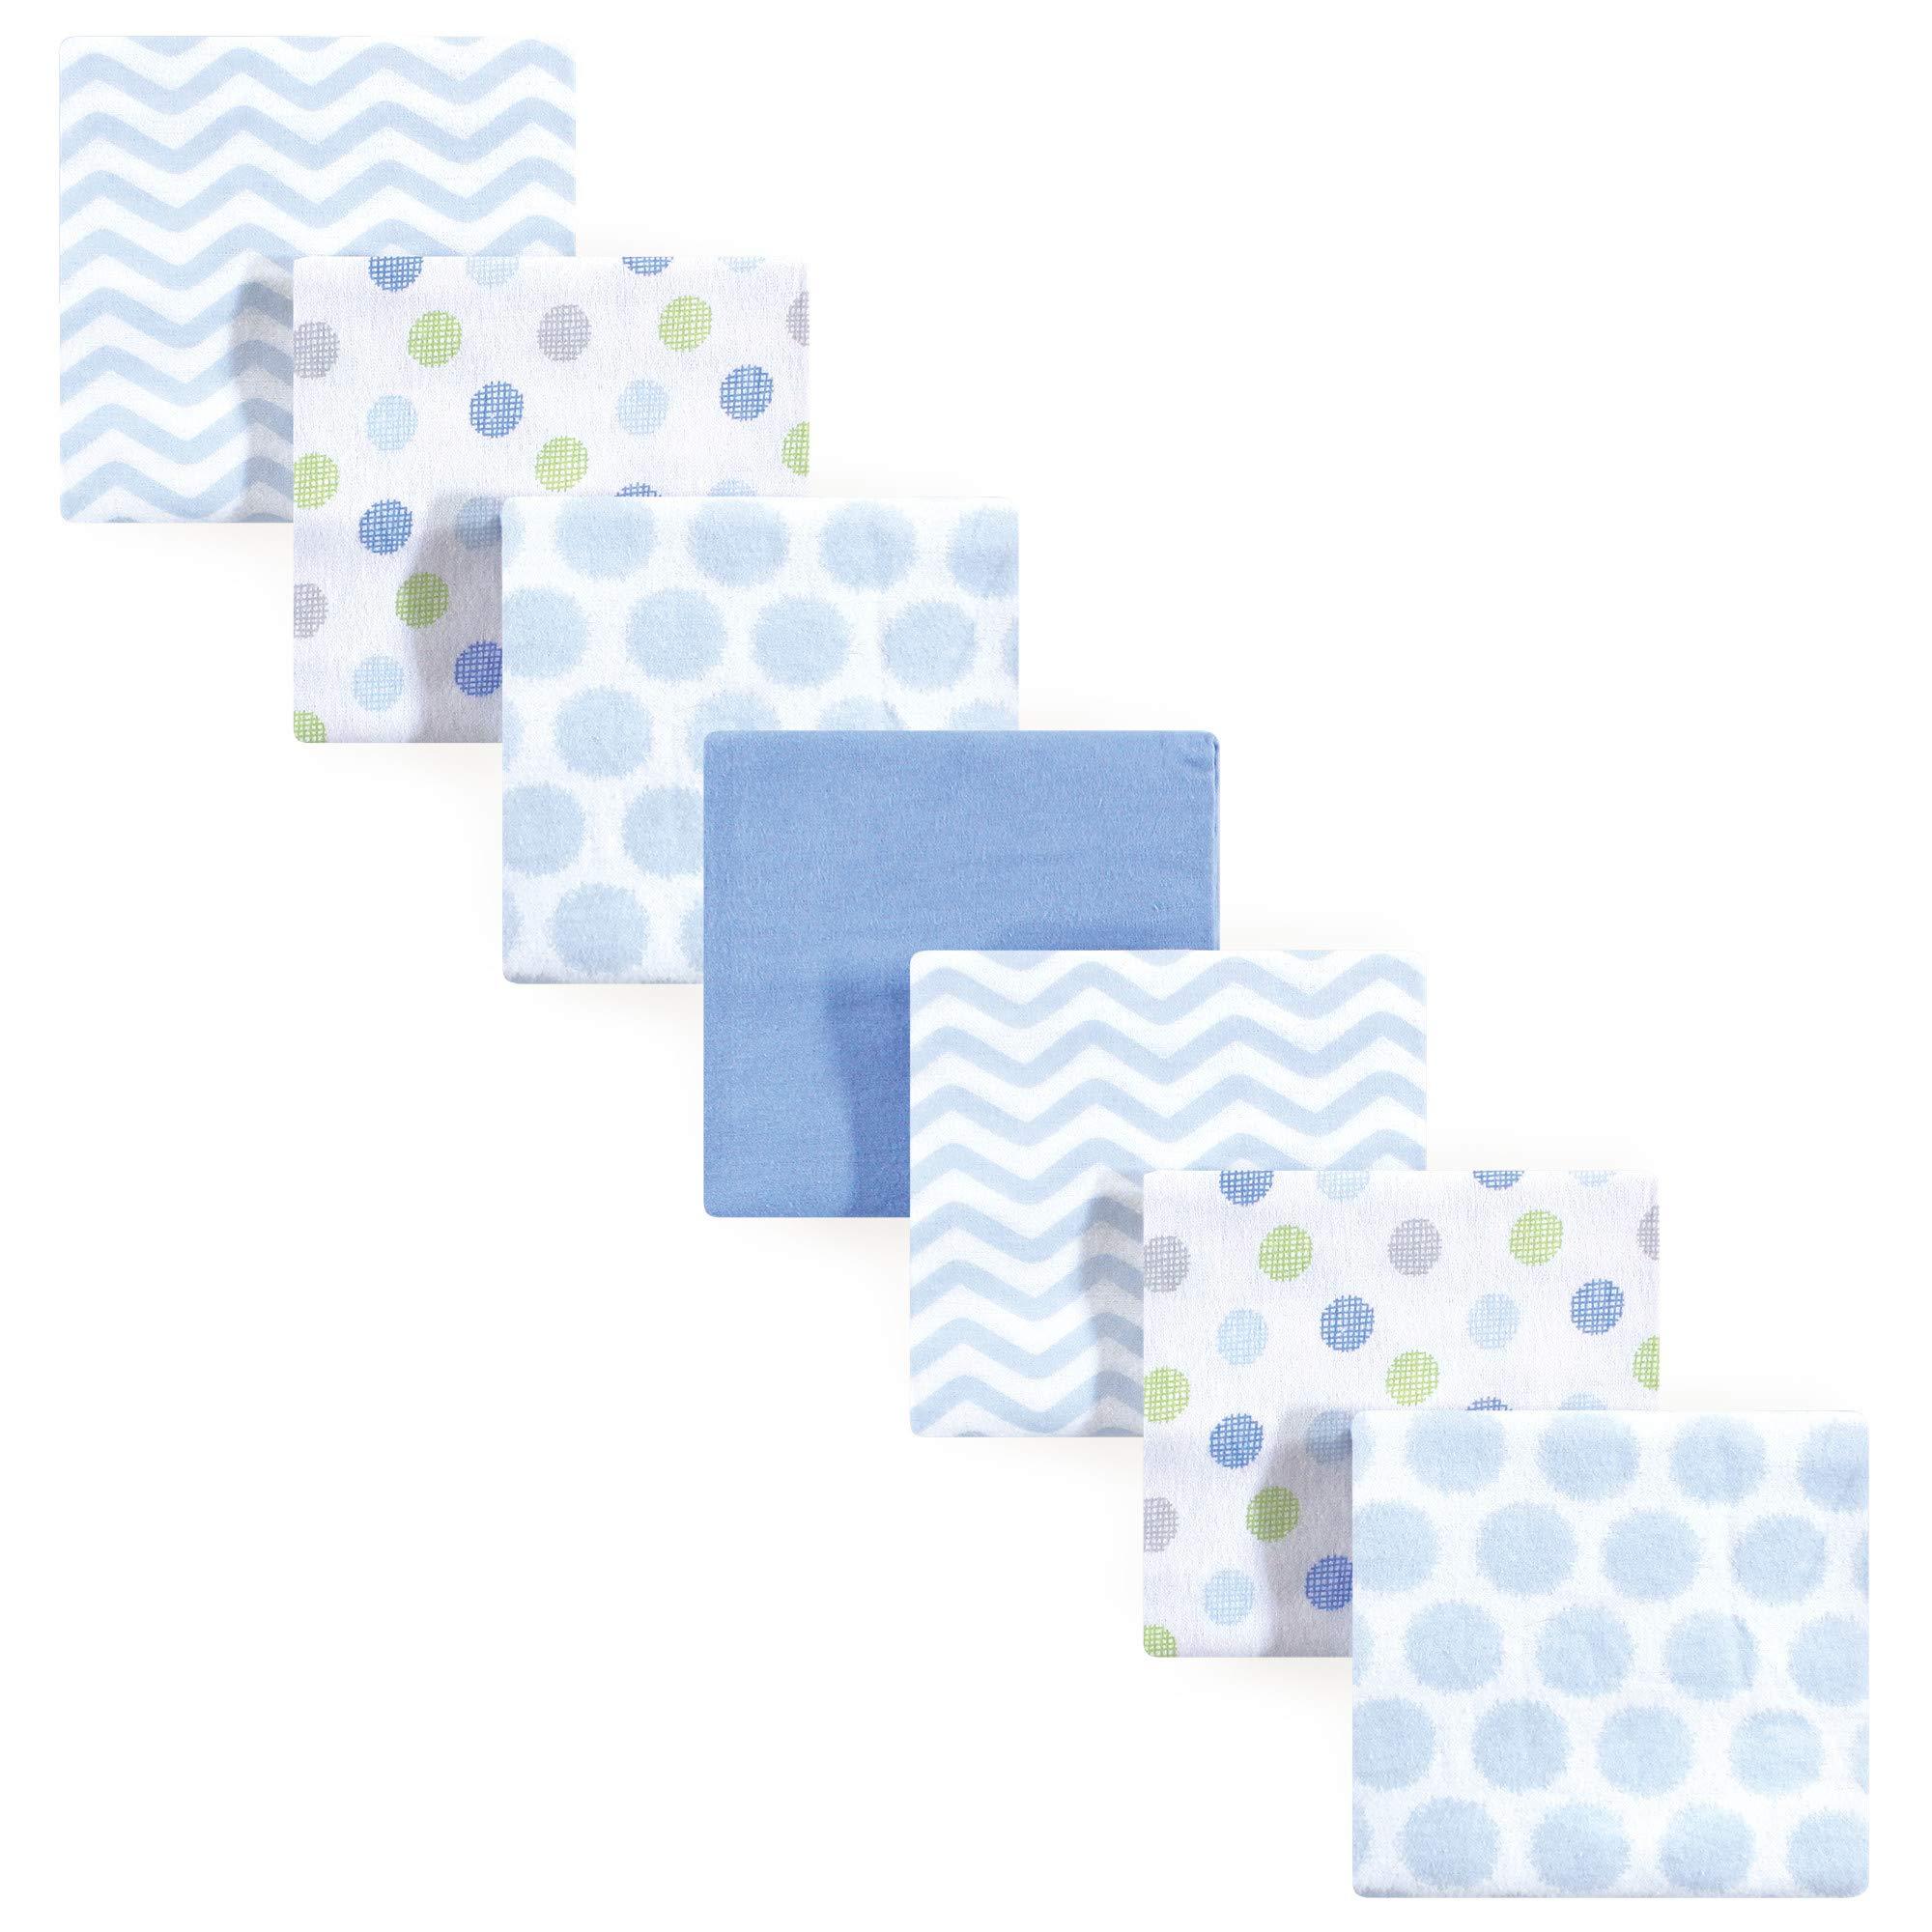 Luvable Friends 7 Piece Flannel Receiving Blanket, Blue, One Size by Luvable Friends